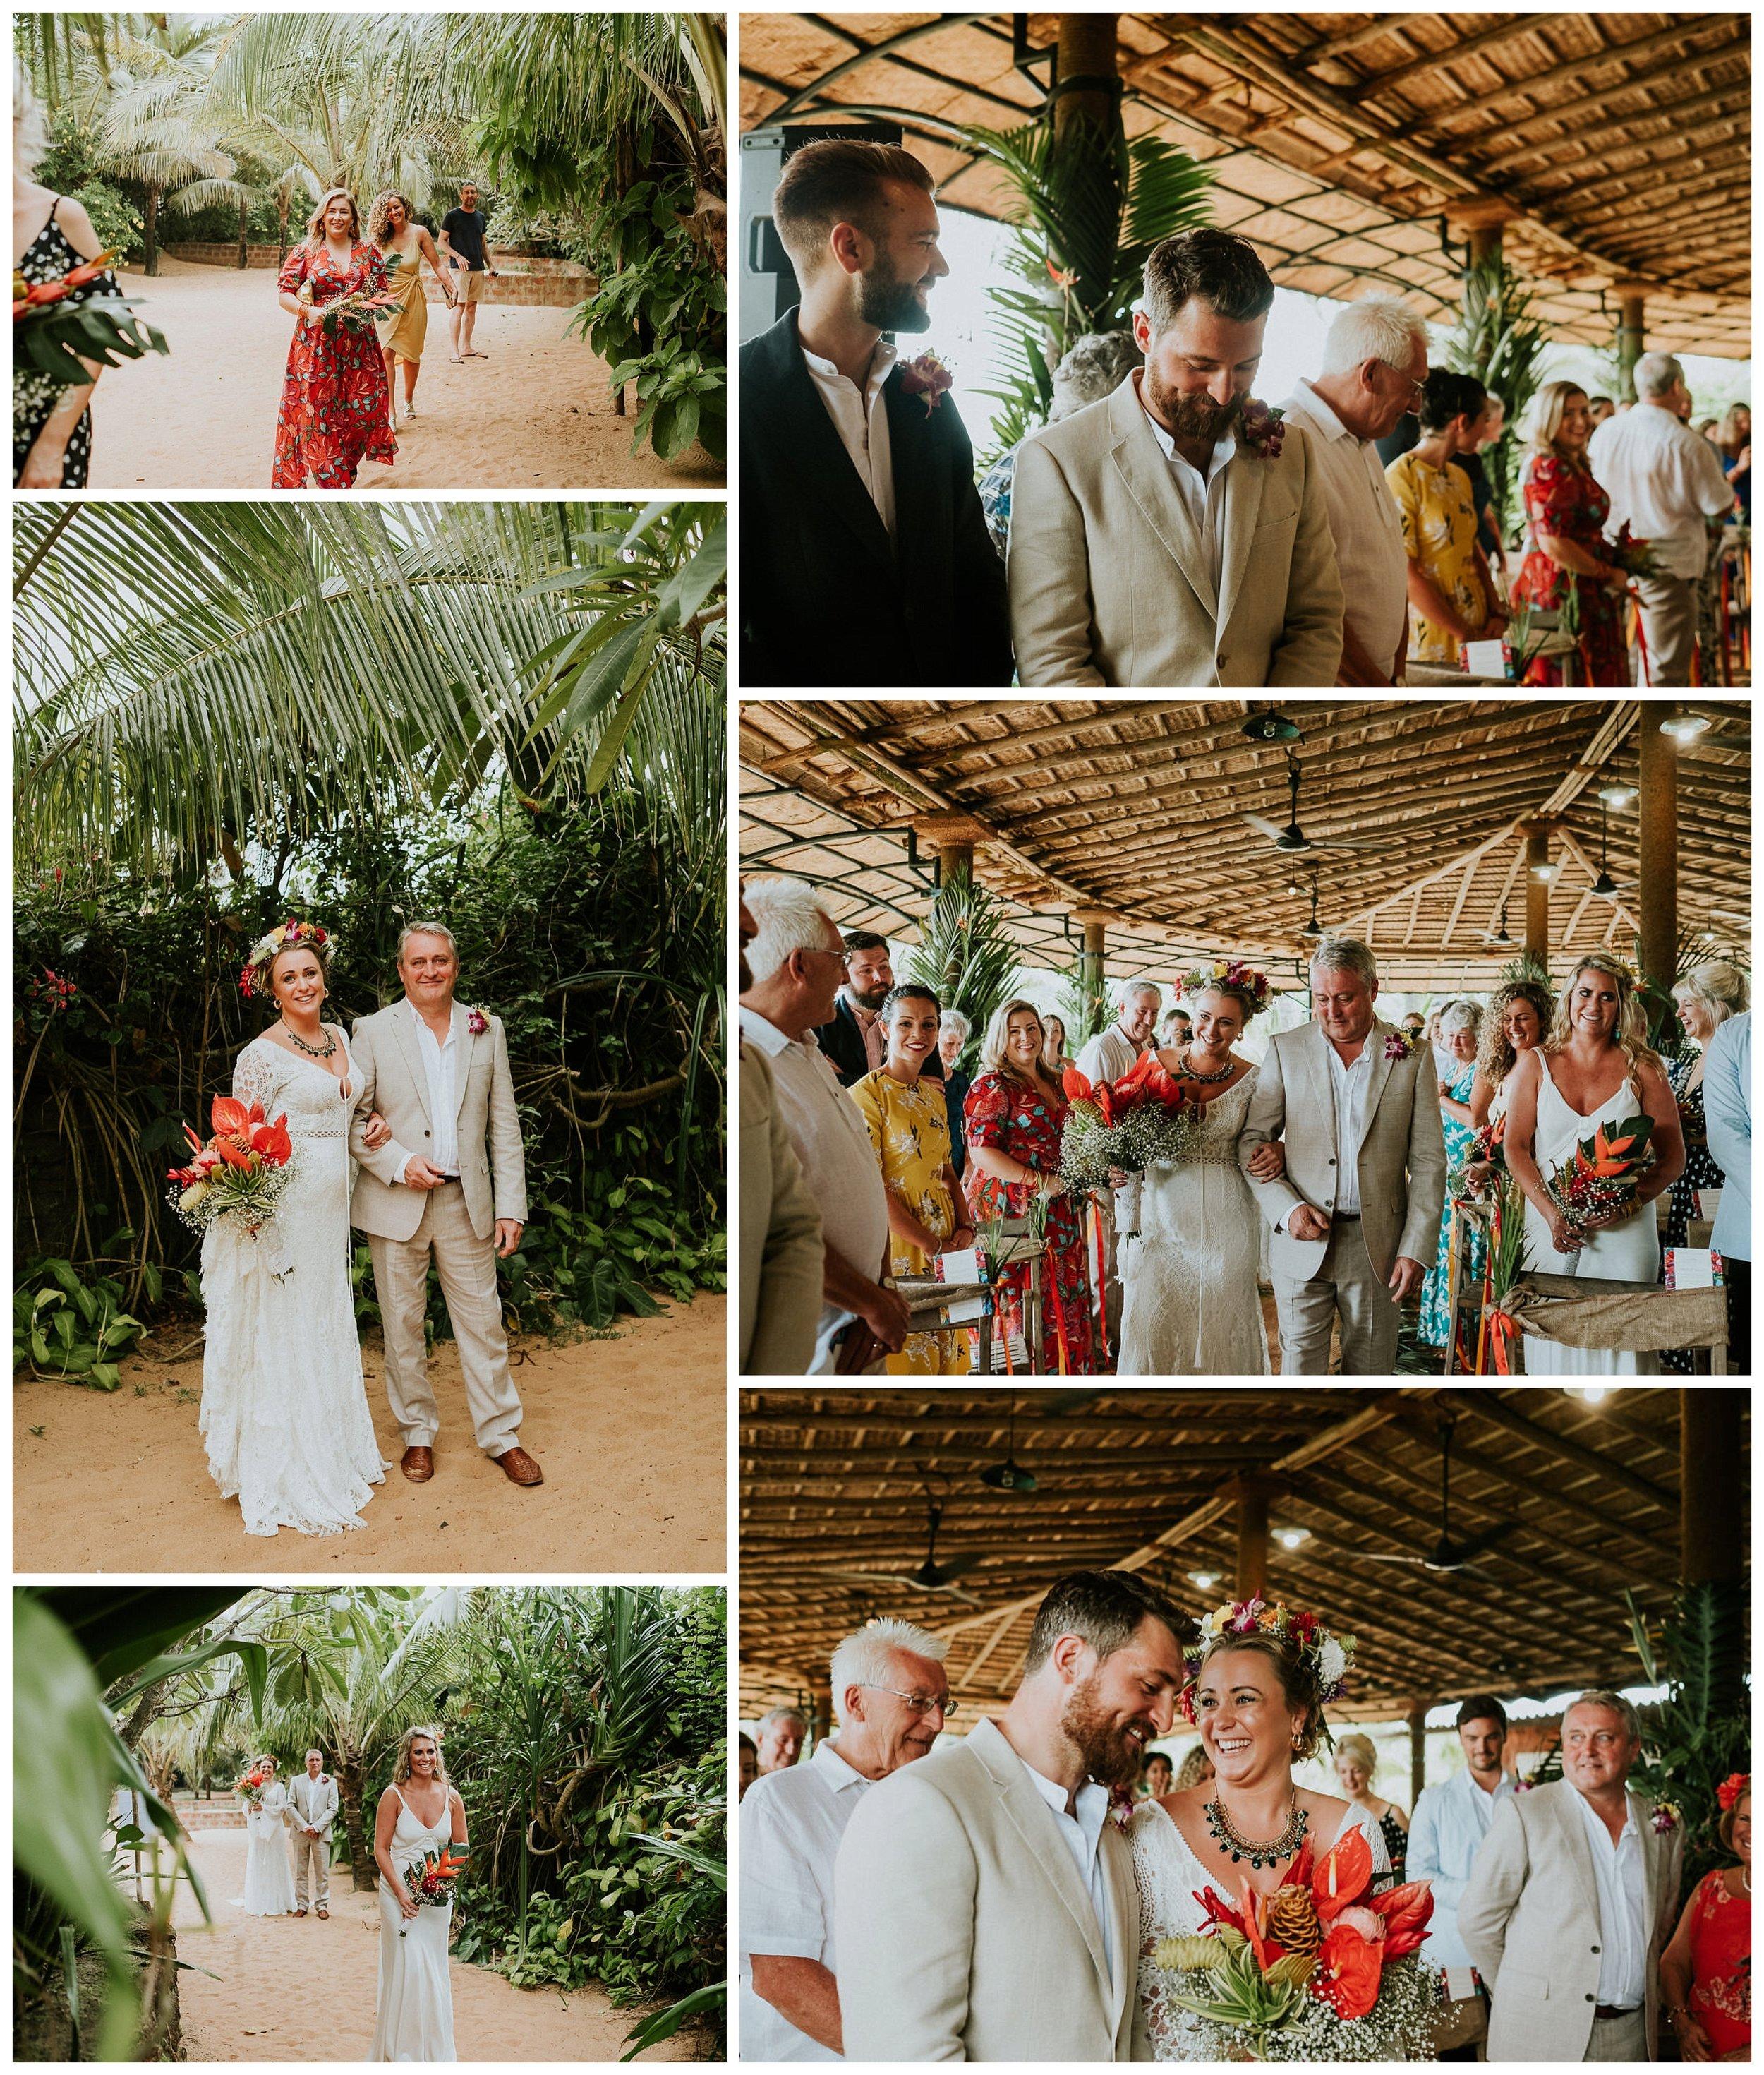 Goa Destination Wedding Photographer India Colouful Fun Joanna Nicole Photography Coco Shambhala10.jpg